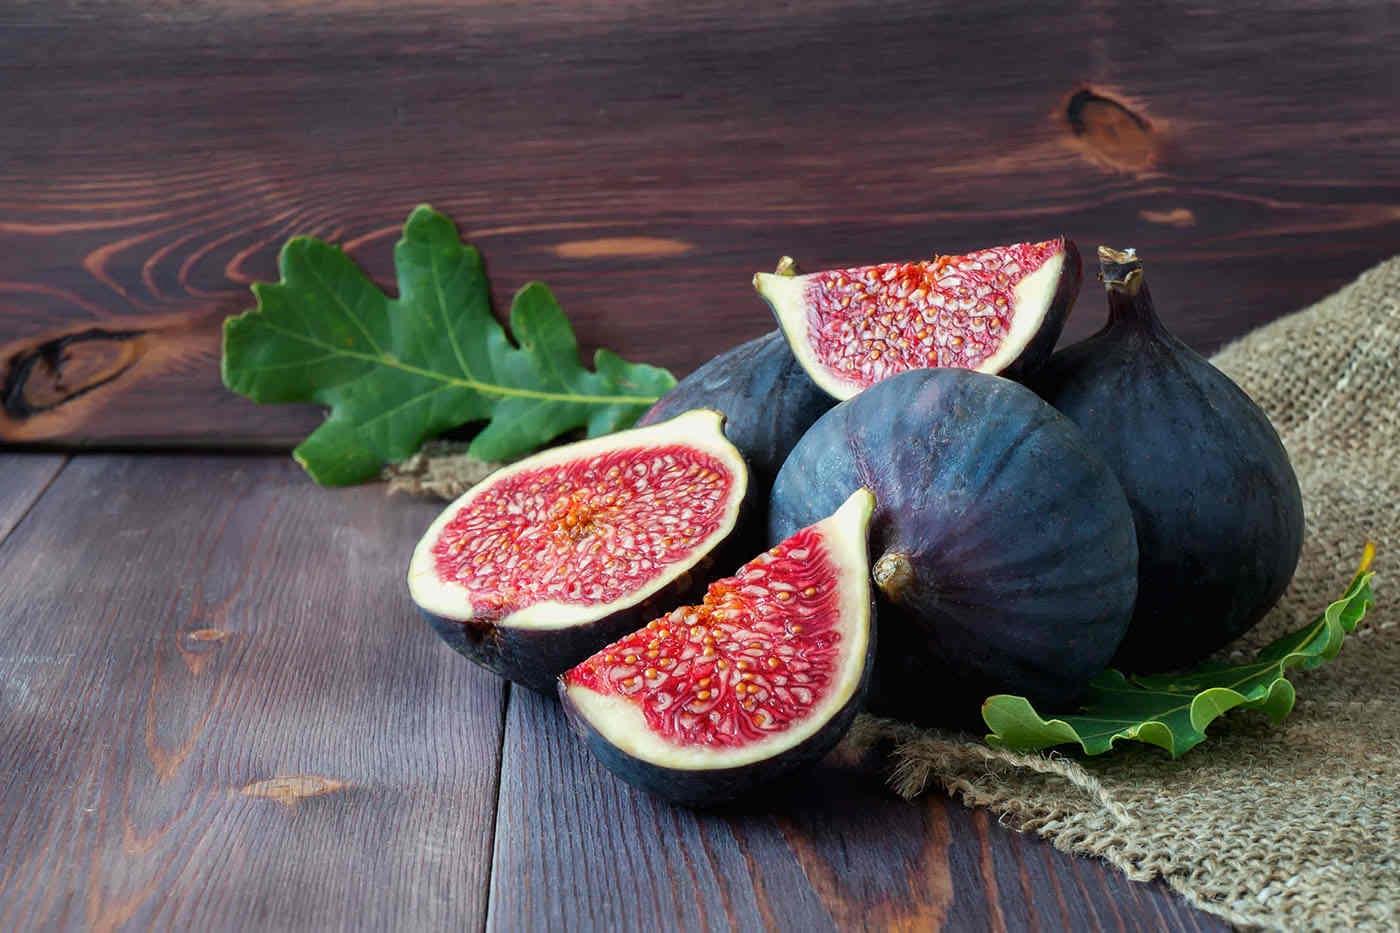 Smochine - 5 beneficii pentru organism